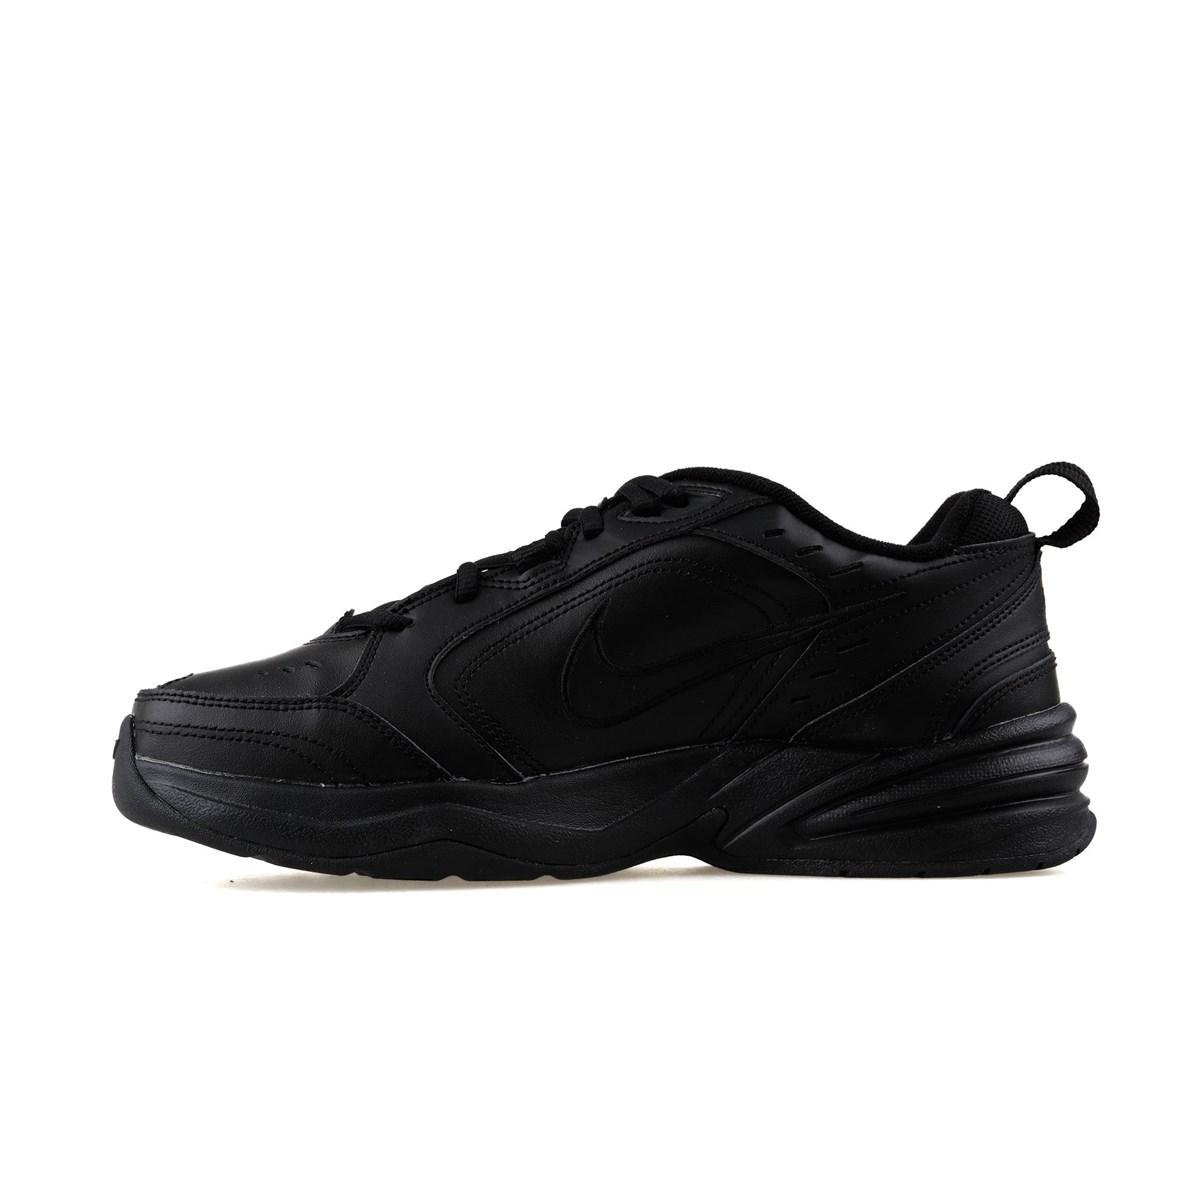 Air Monarch Siyah Erkek Spor Ayakkabı